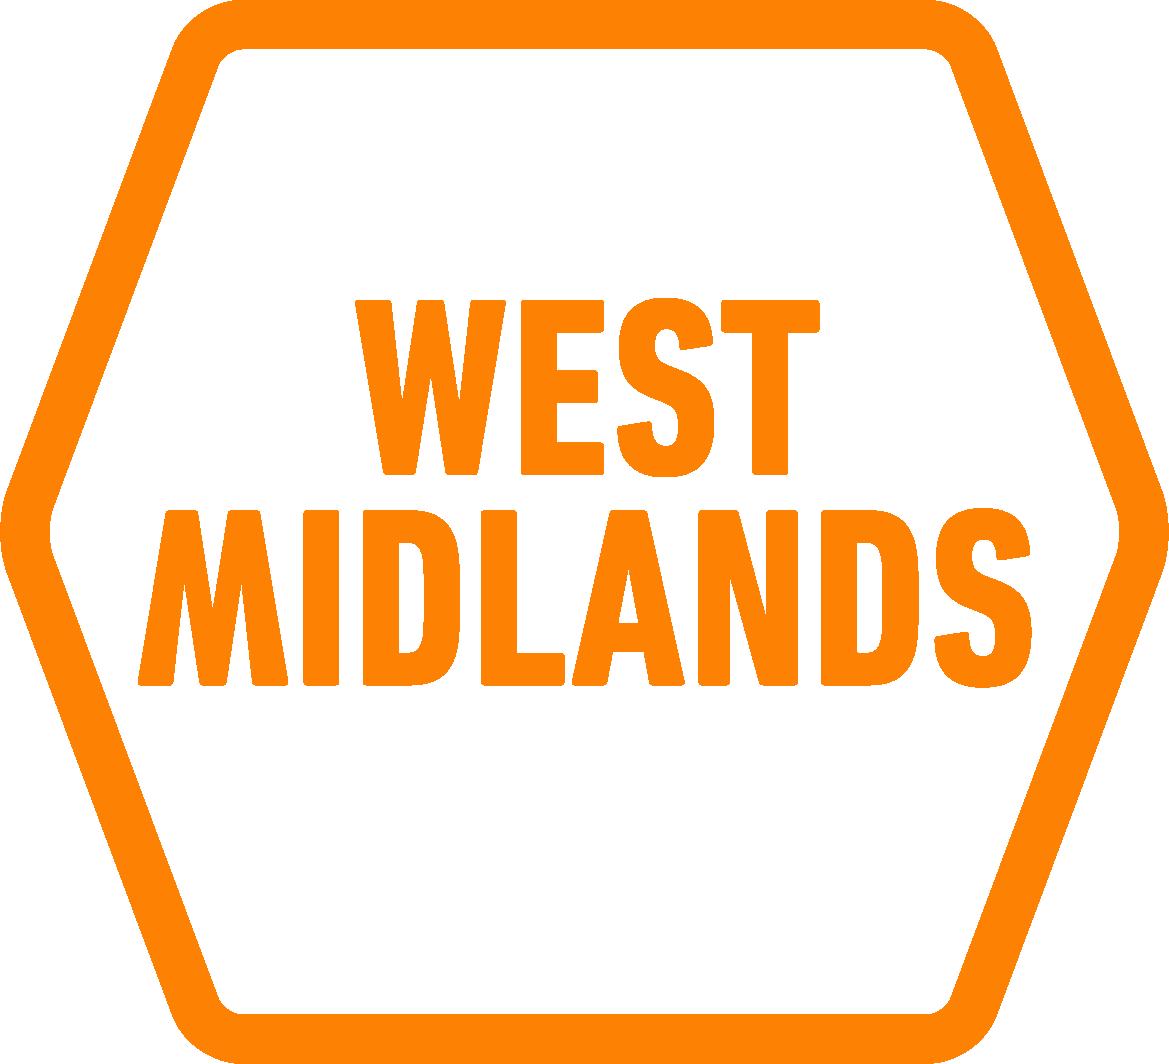 West Midlands Growth Company